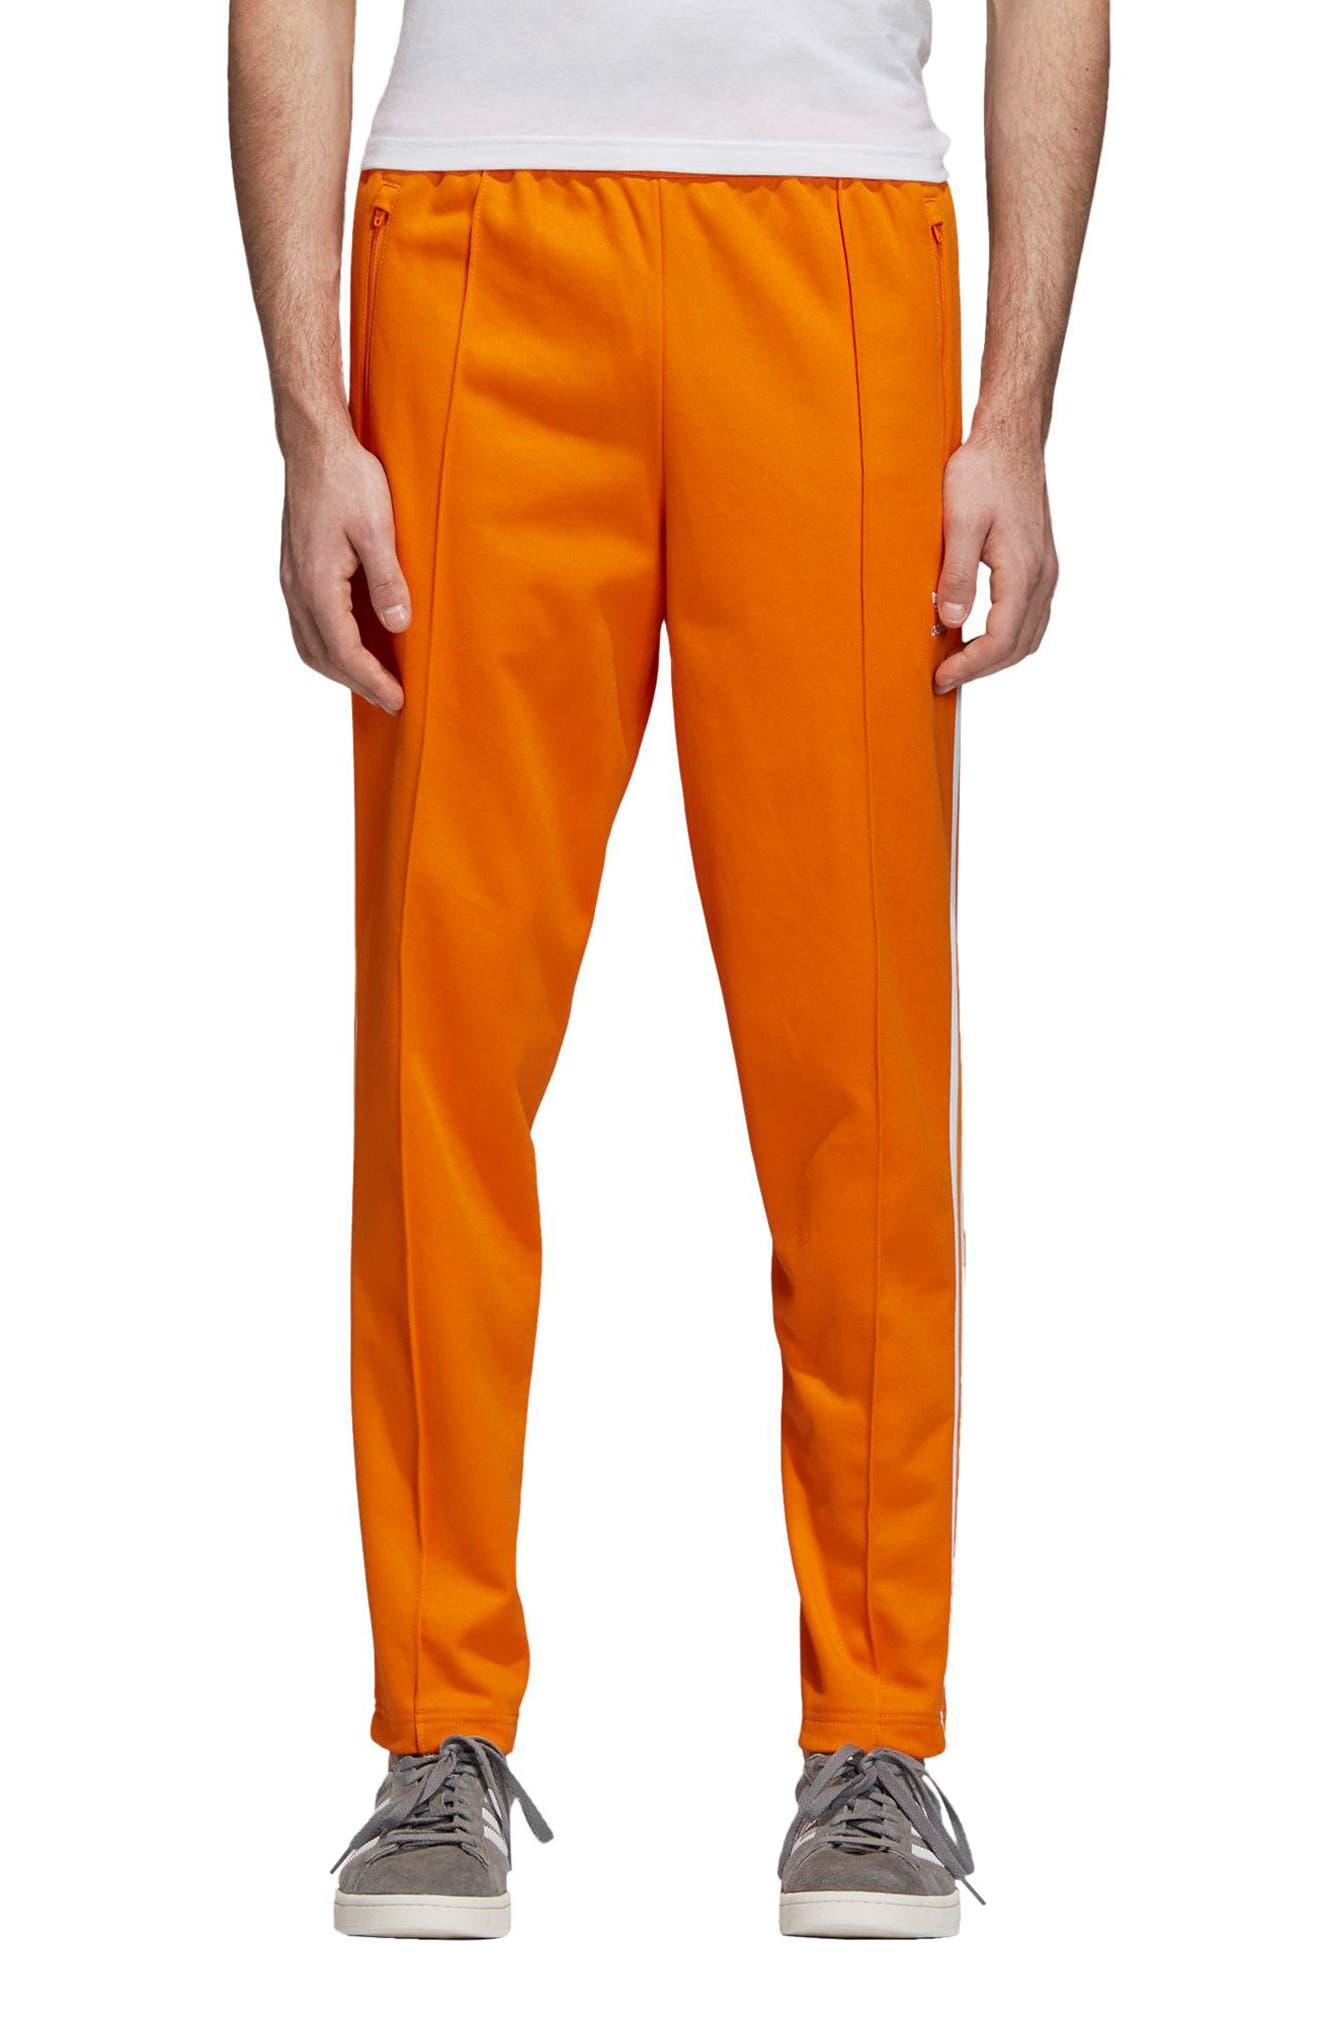 BB Track Pants,                         Main,                         color, Bright Orange